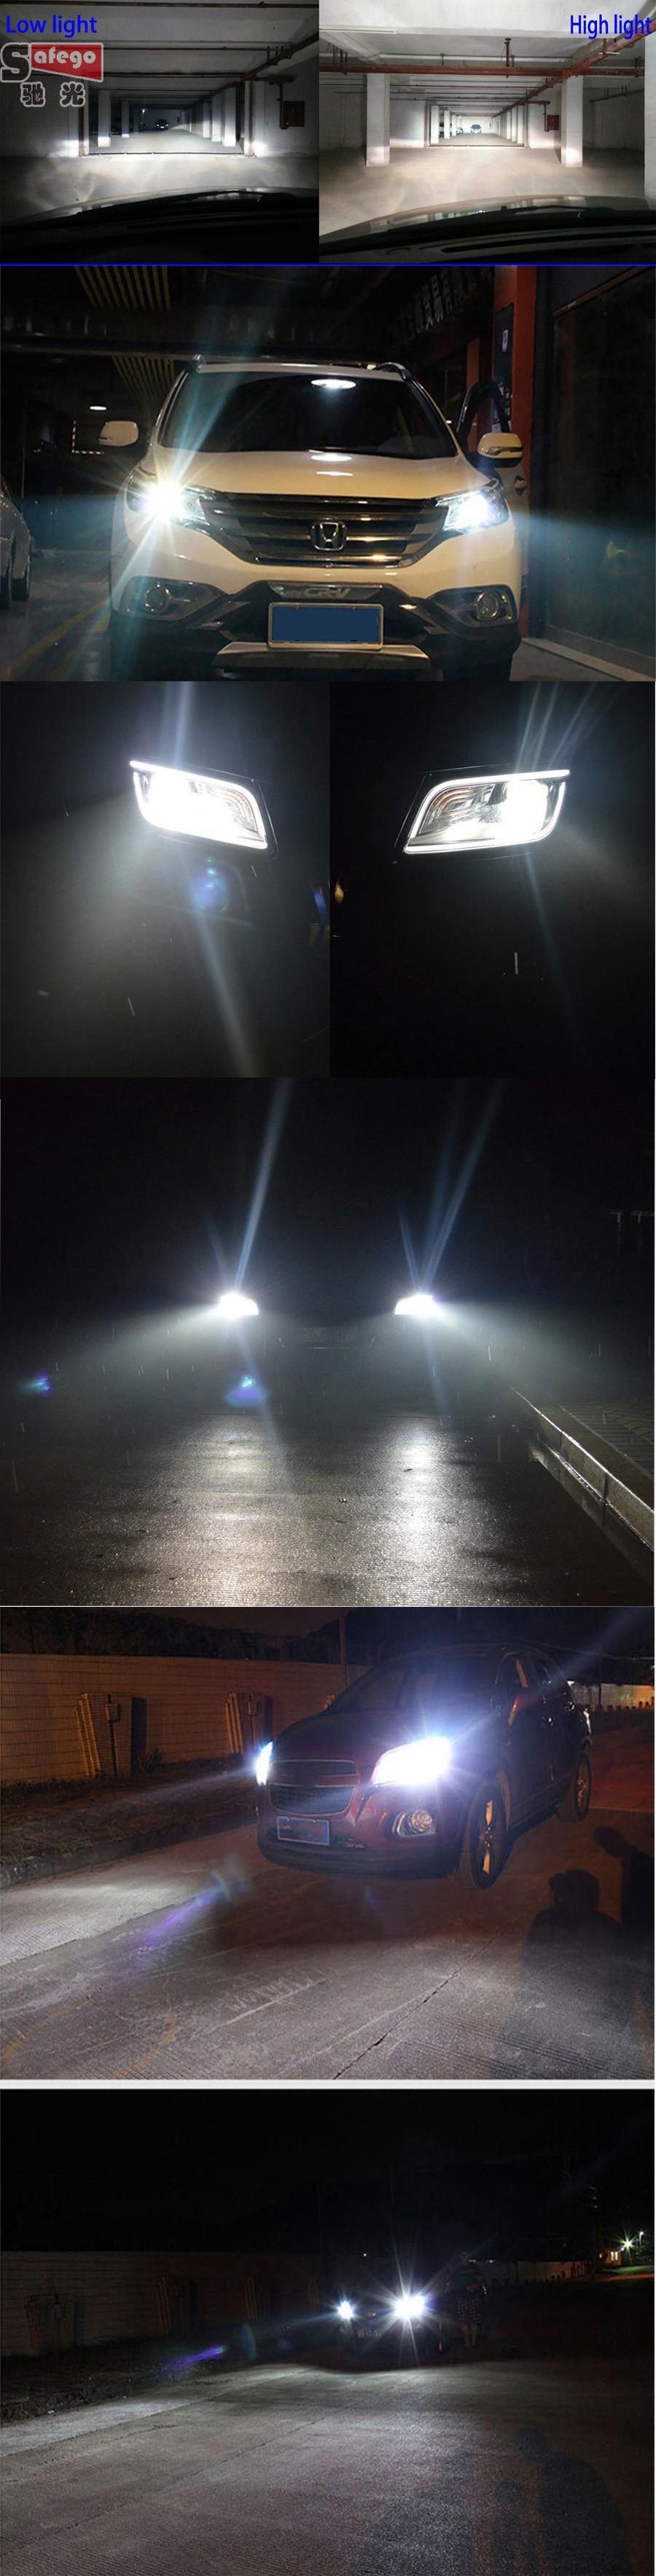 11-HID light effect